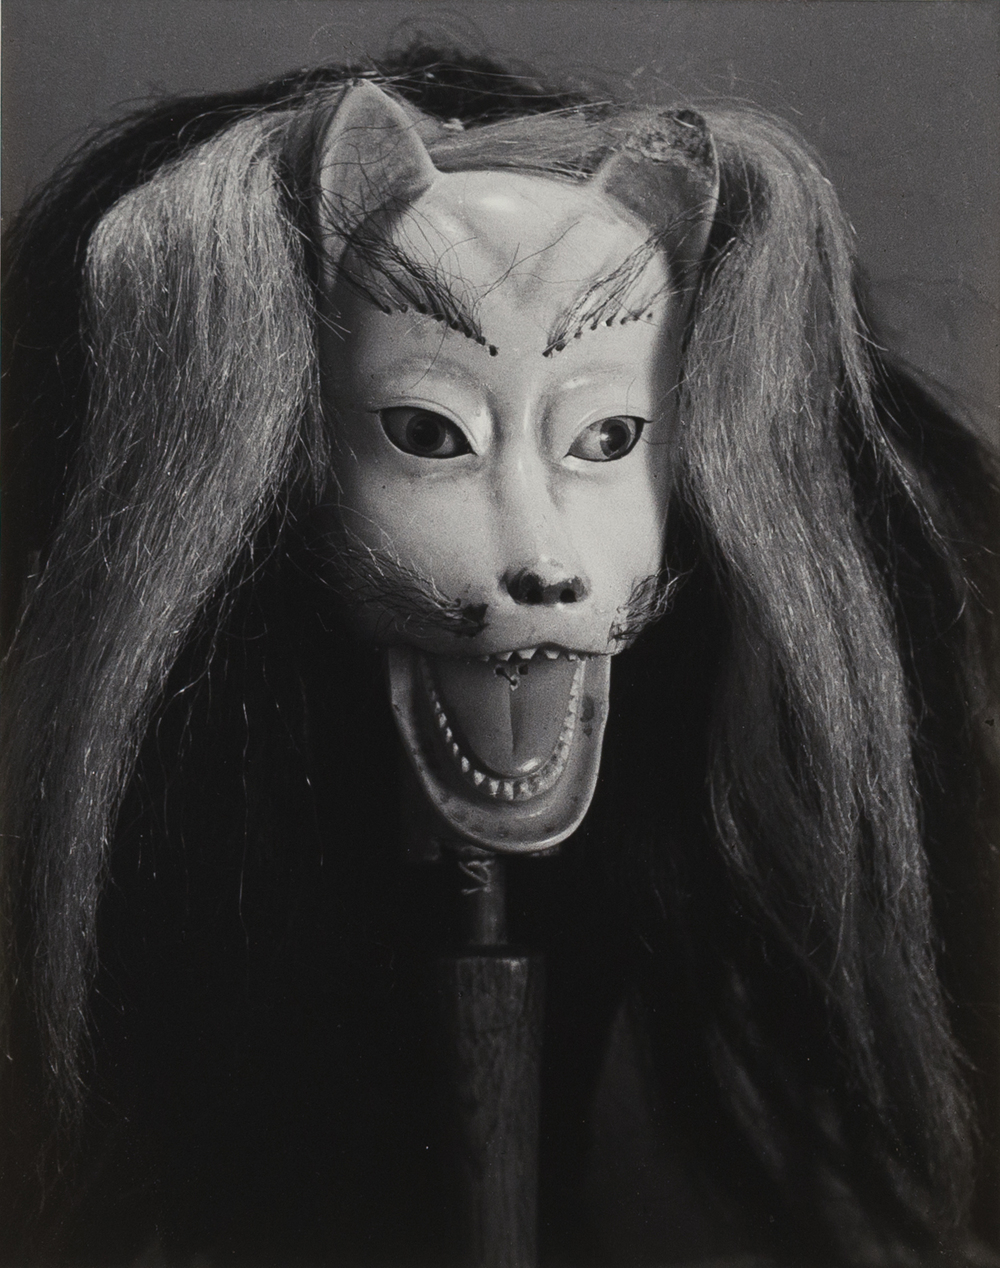 rie Taikichi, Aus der Folge Bunraku Theater, Osaka, 1941, Silbergelatineabzug, 34,8 x 27,4 cm, © Irie Taikichi Memorial Museum